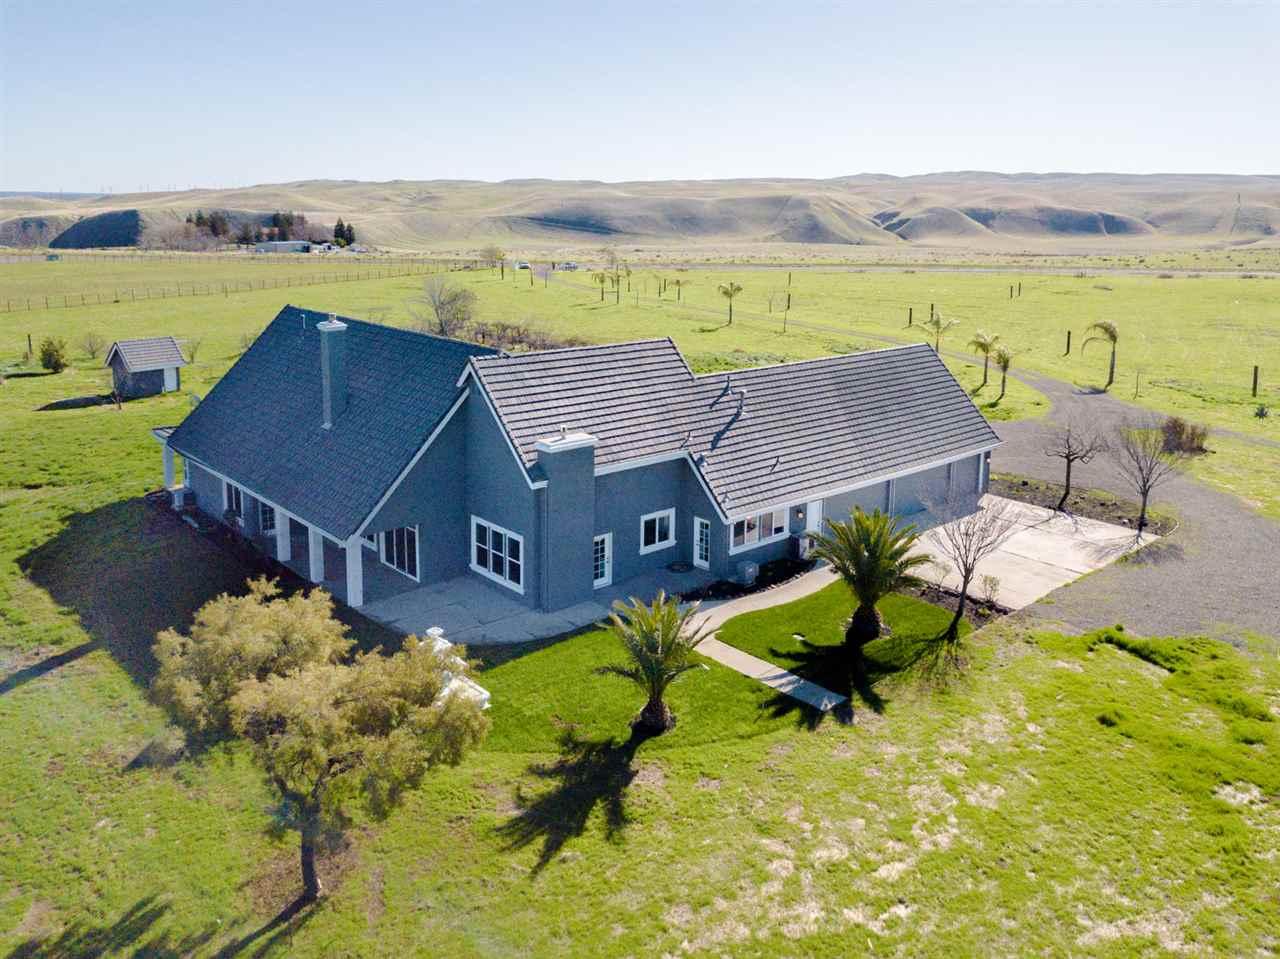 Single Family Home for Sale at 22090 Arburua 22090 Arburua Los Banos, California 93635 United States